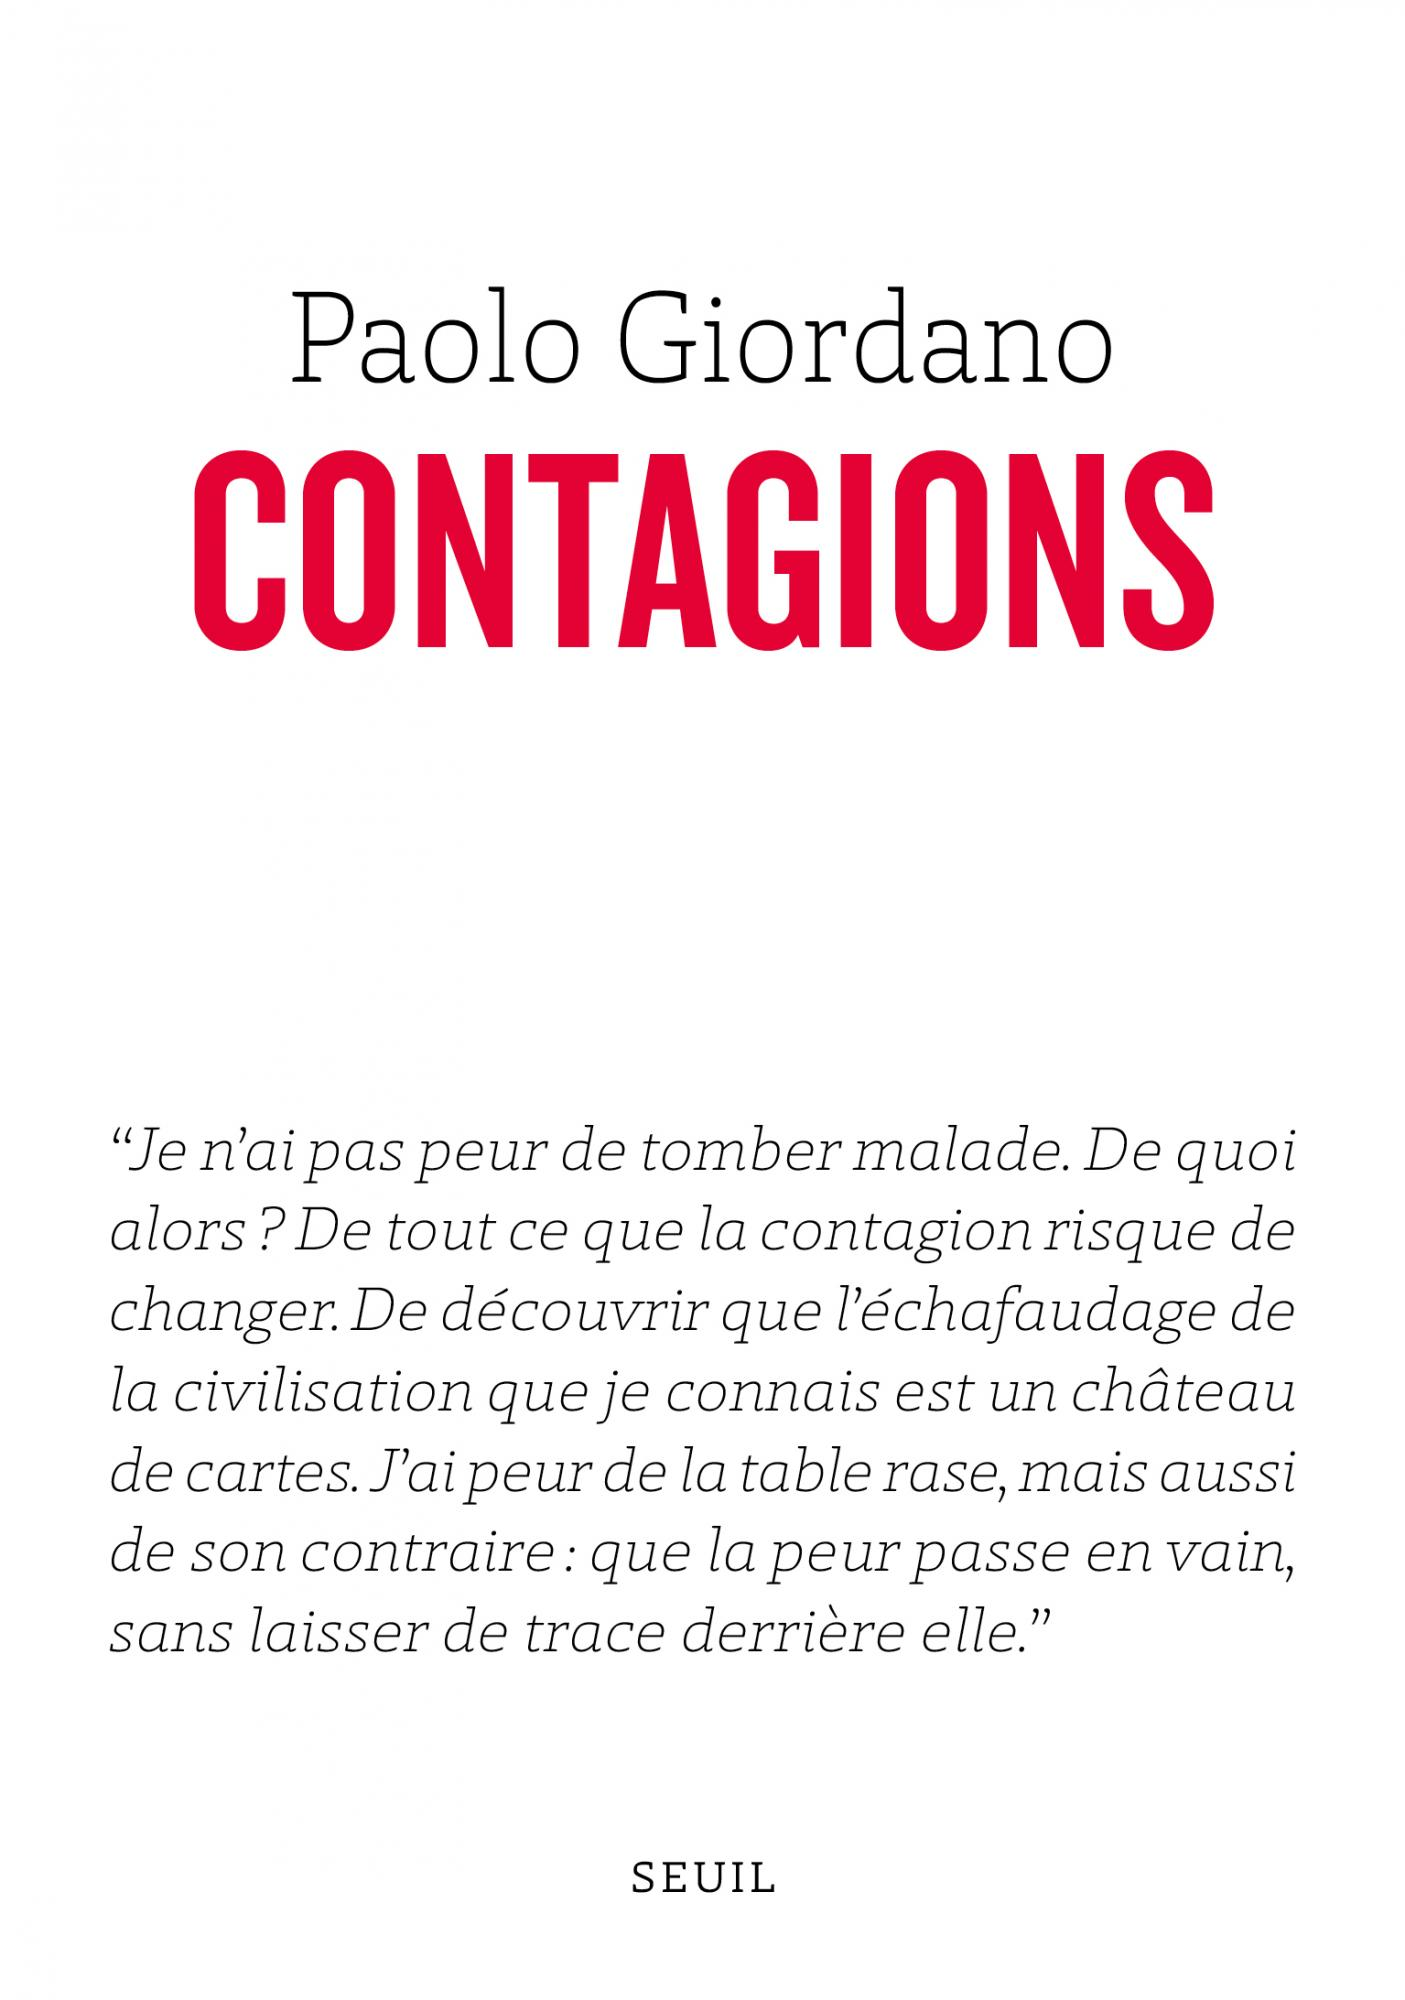 Couverture de l'ouvrage Contagions de Paolo Giordano